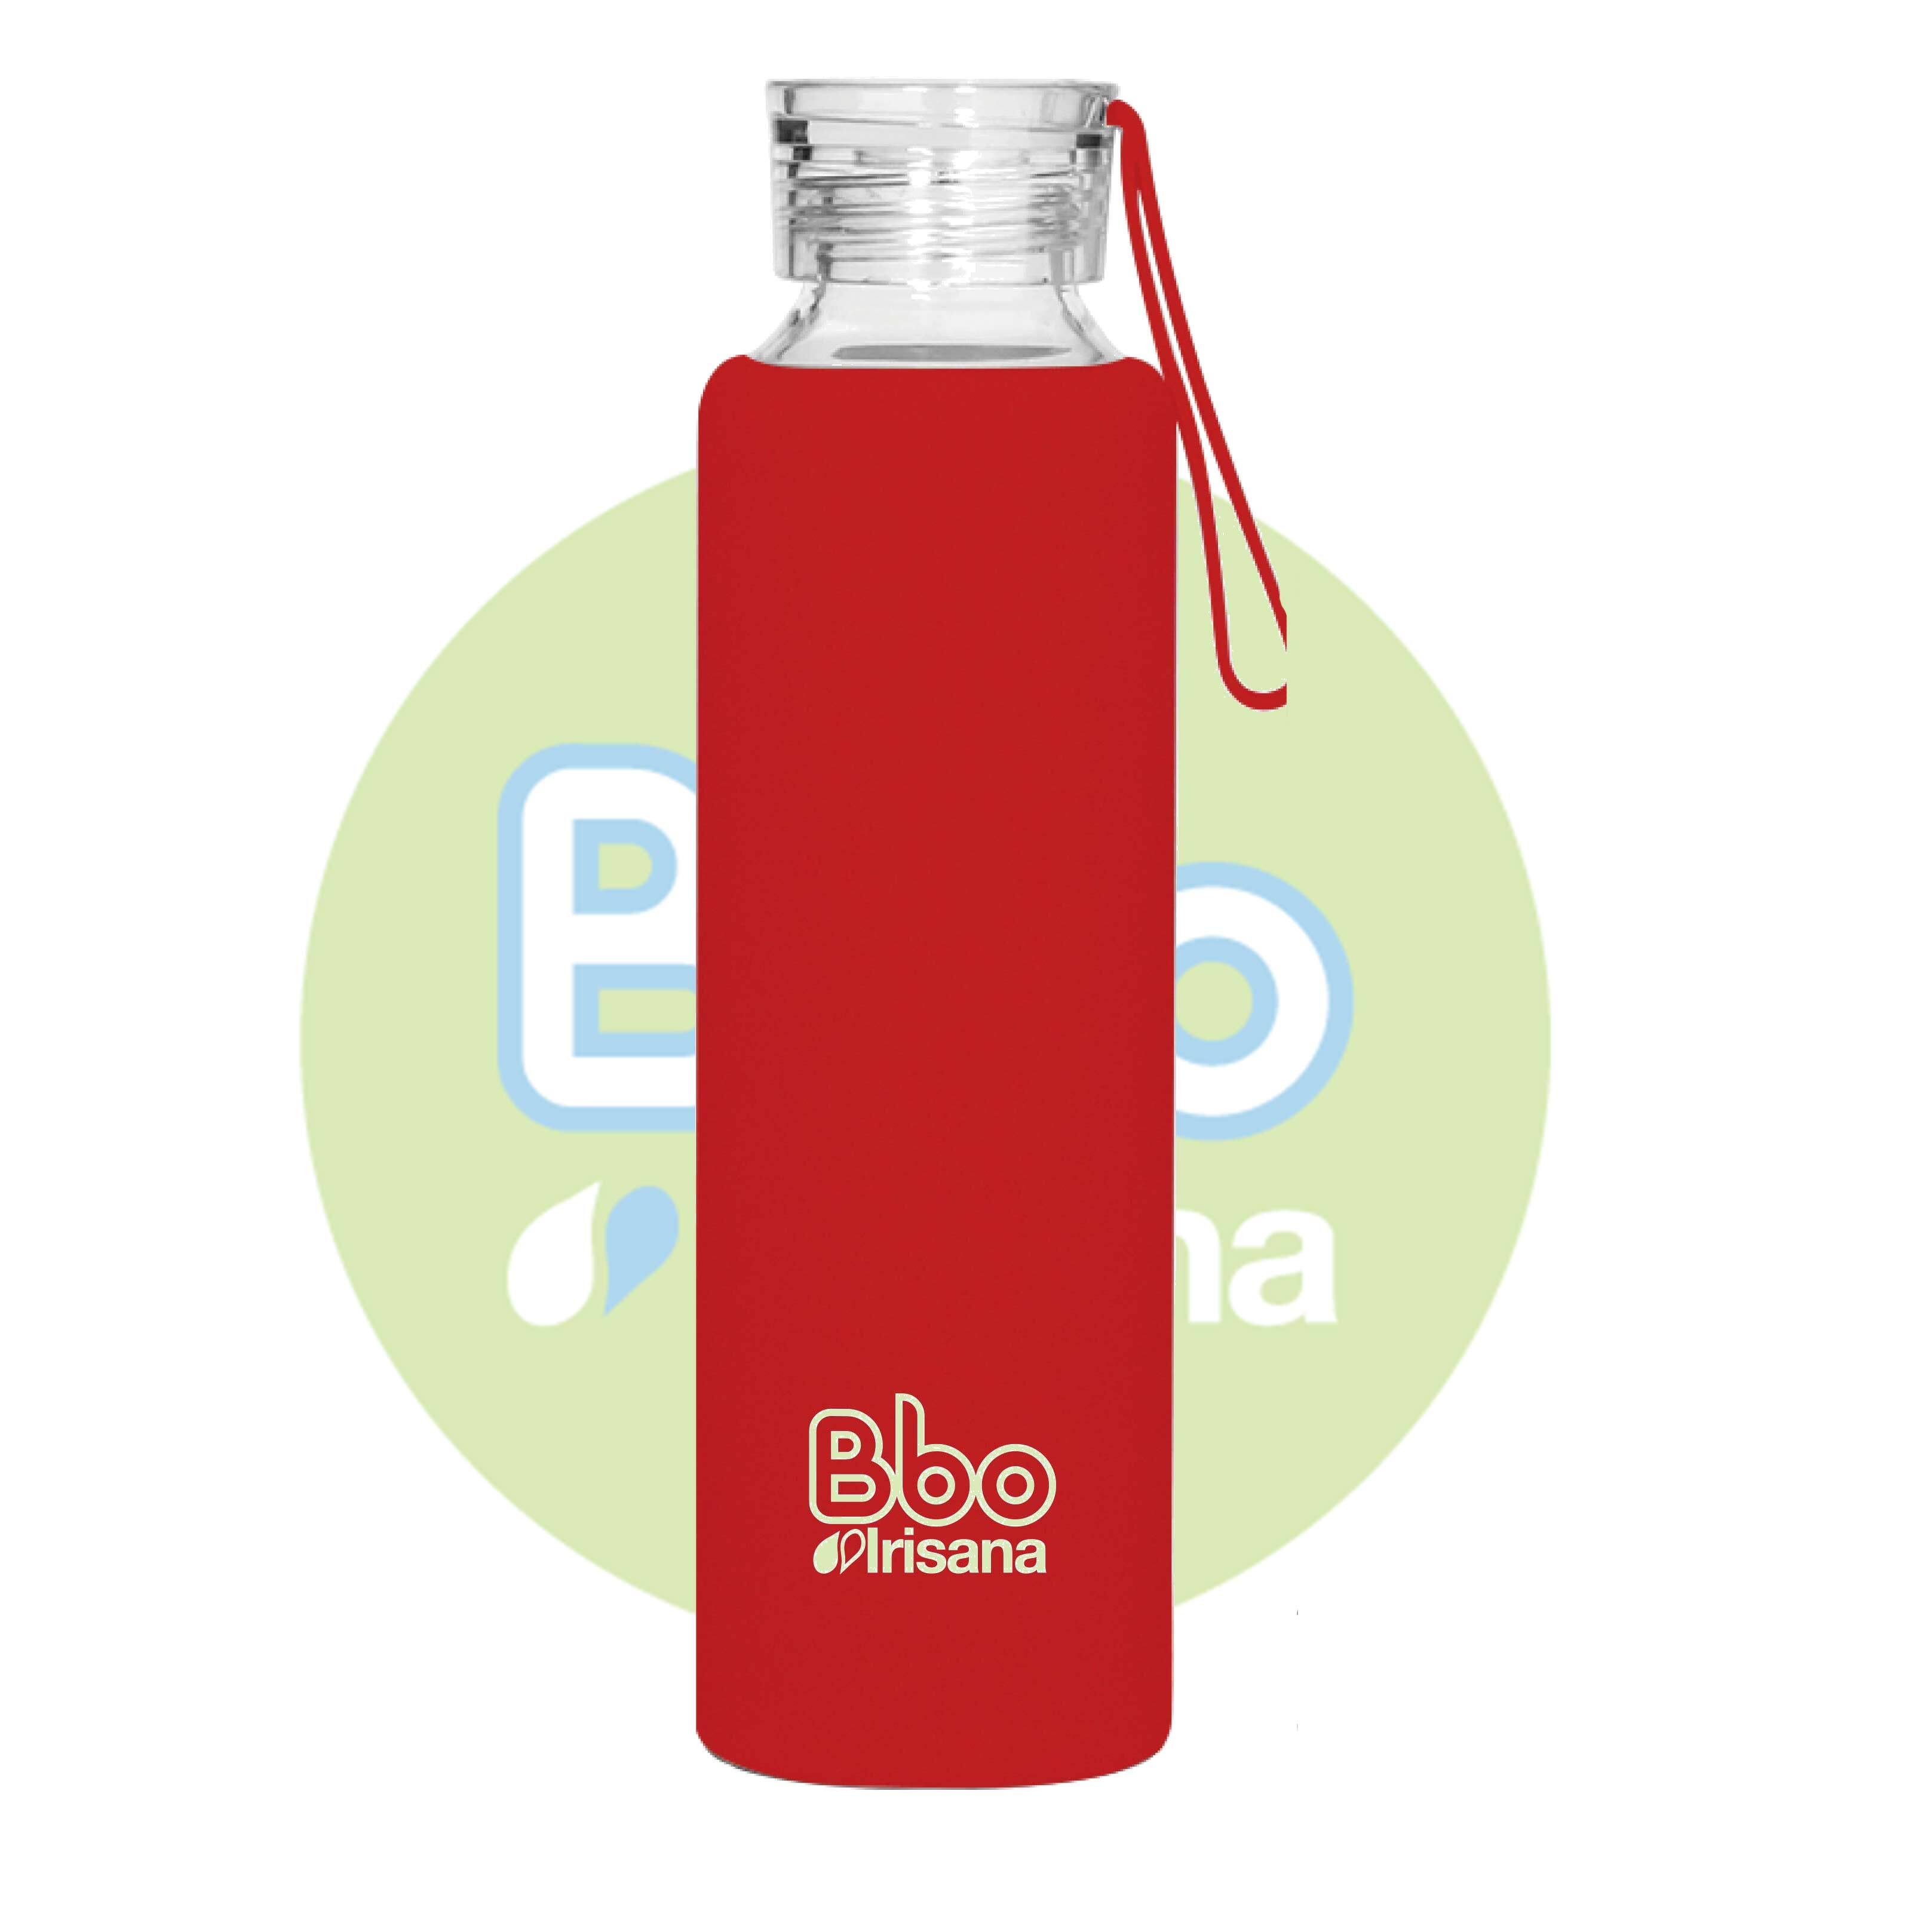 BOTELLA BBO ROJA BOROSILICATO CON SILICONA 550 ml. IRISANA en Biovegalia